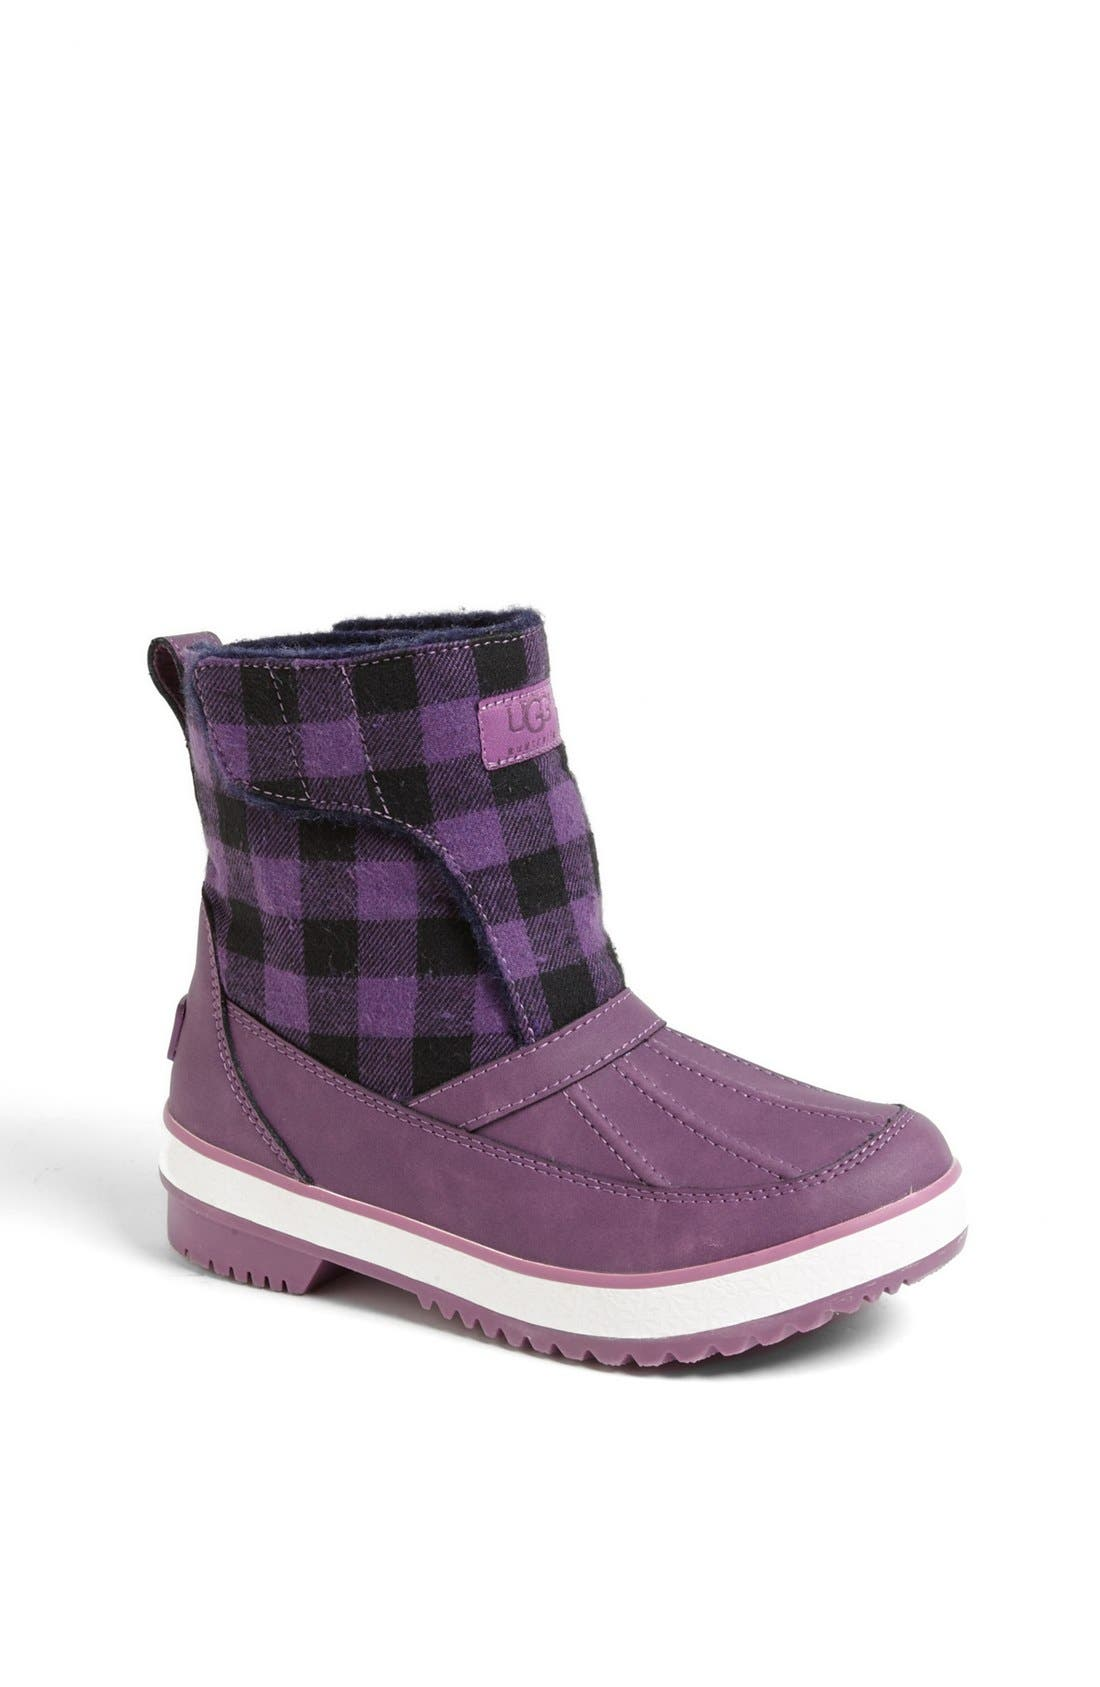 Alternate Image 1 Selected - UGG® Australia 'Astin' Waterproof Boot (Little Kid & Big Kid)